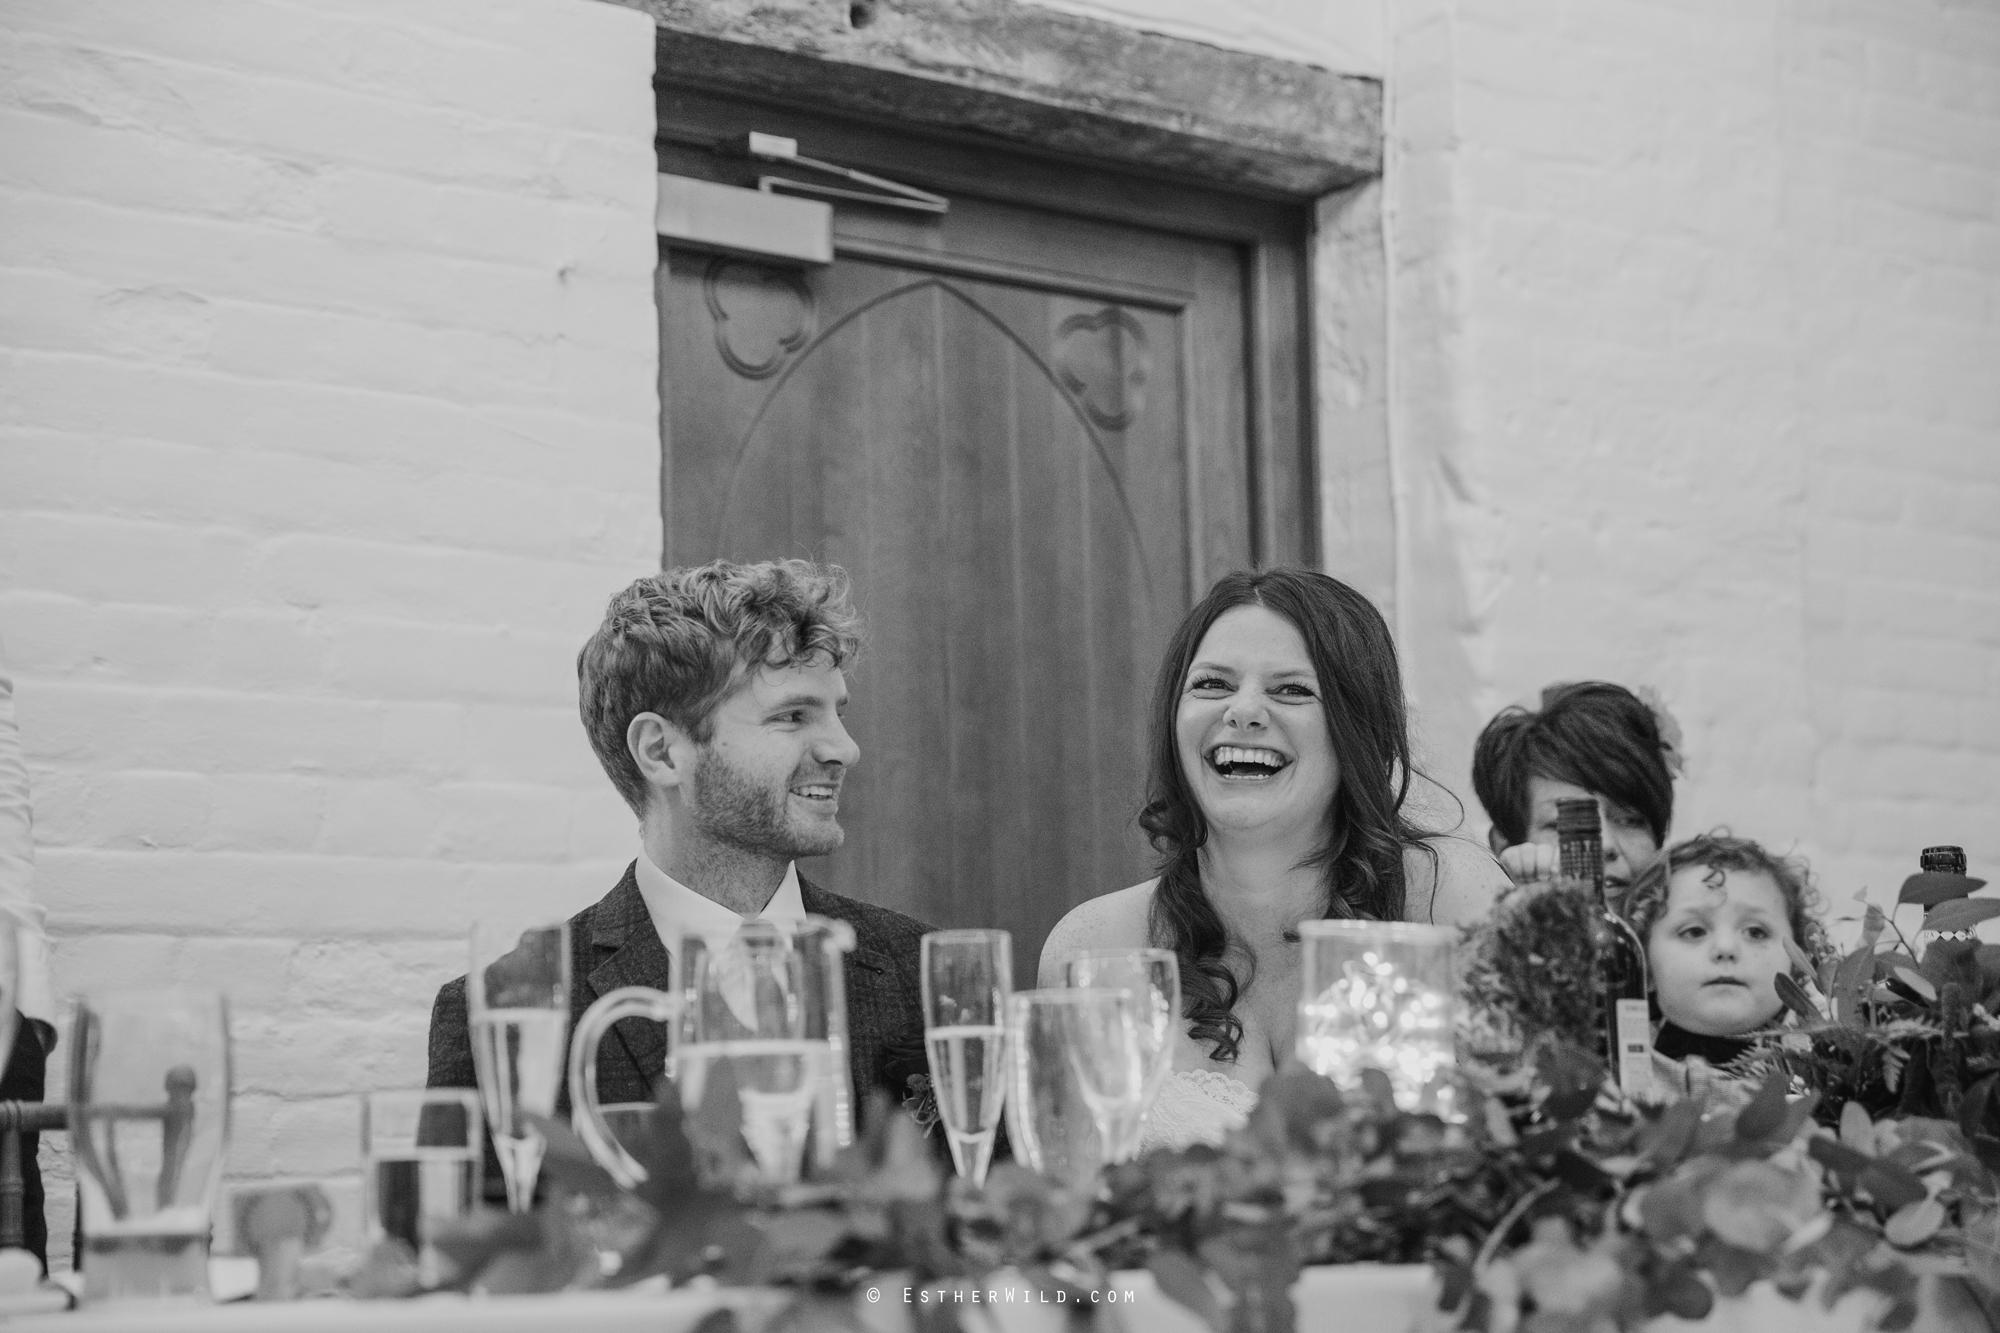 Reading_Room_Weddings_Alby_Norwich_Photographer_Esther_Wild_IMG_2282-1.jpg